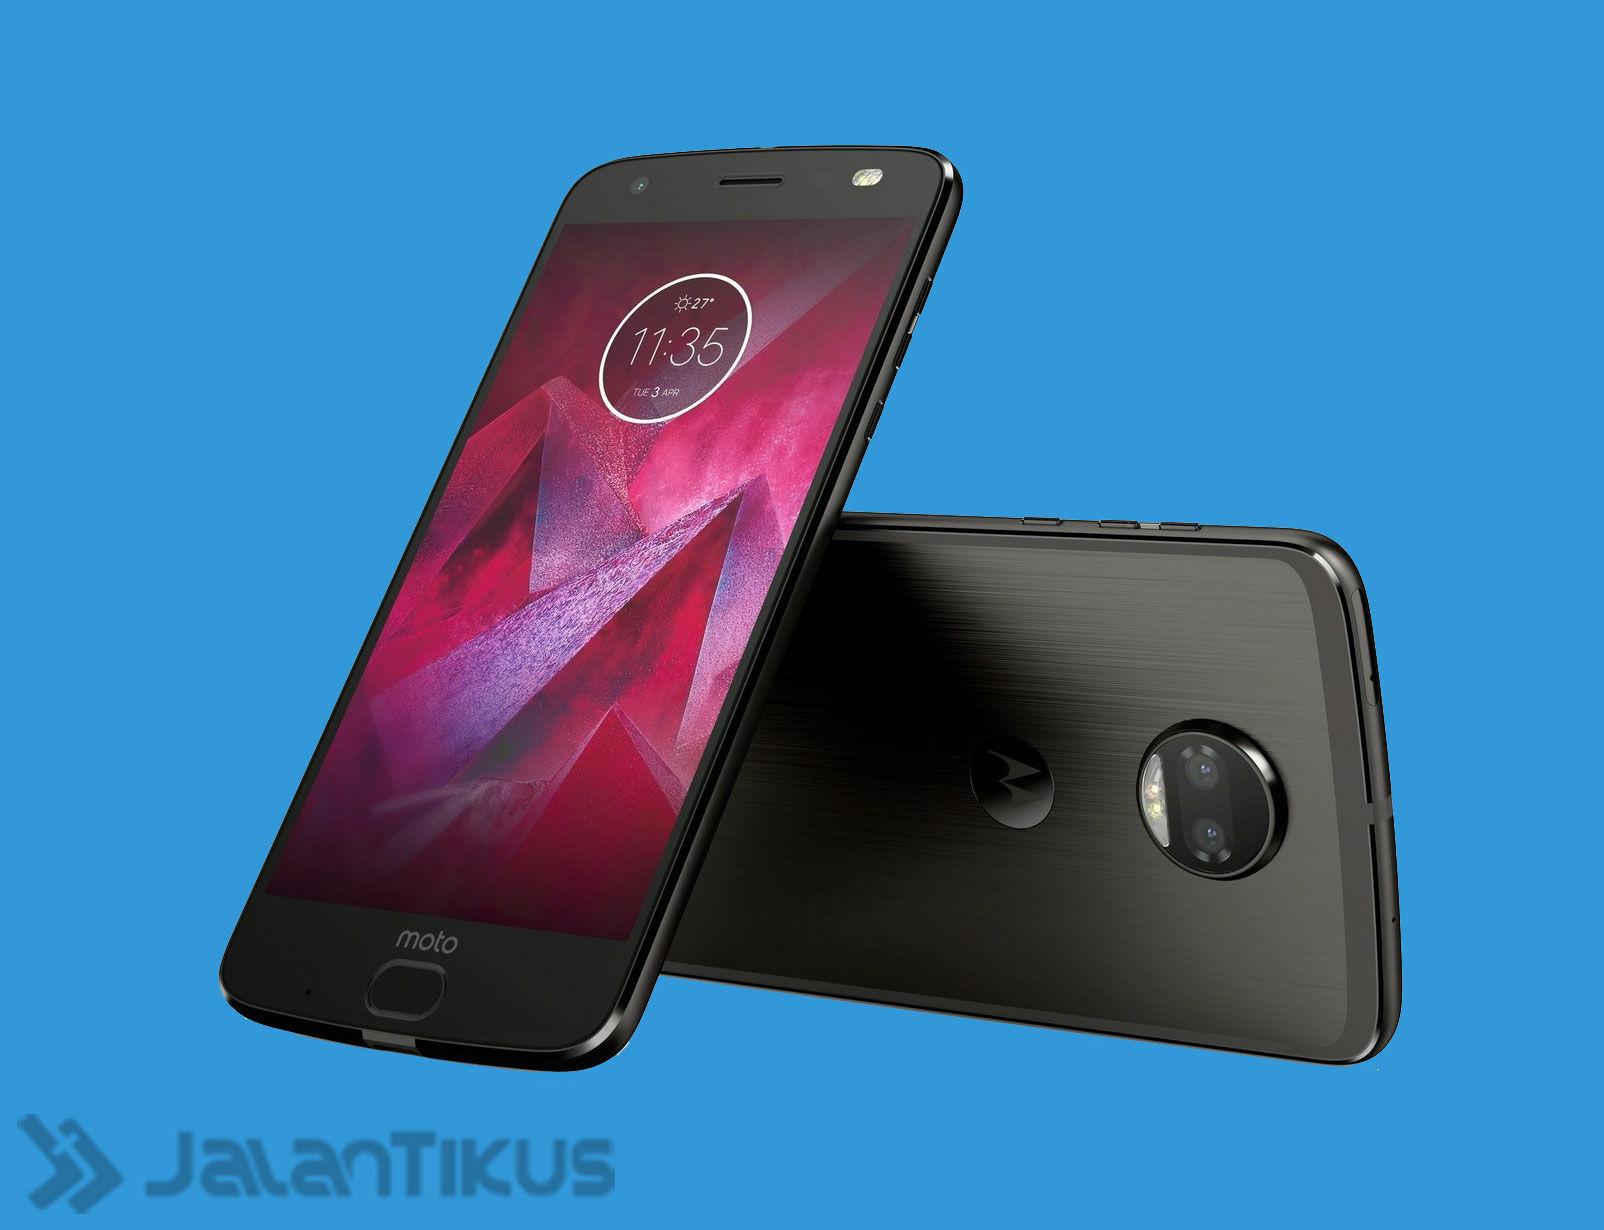 smartphone-android-terbaru-agustus-2017-3